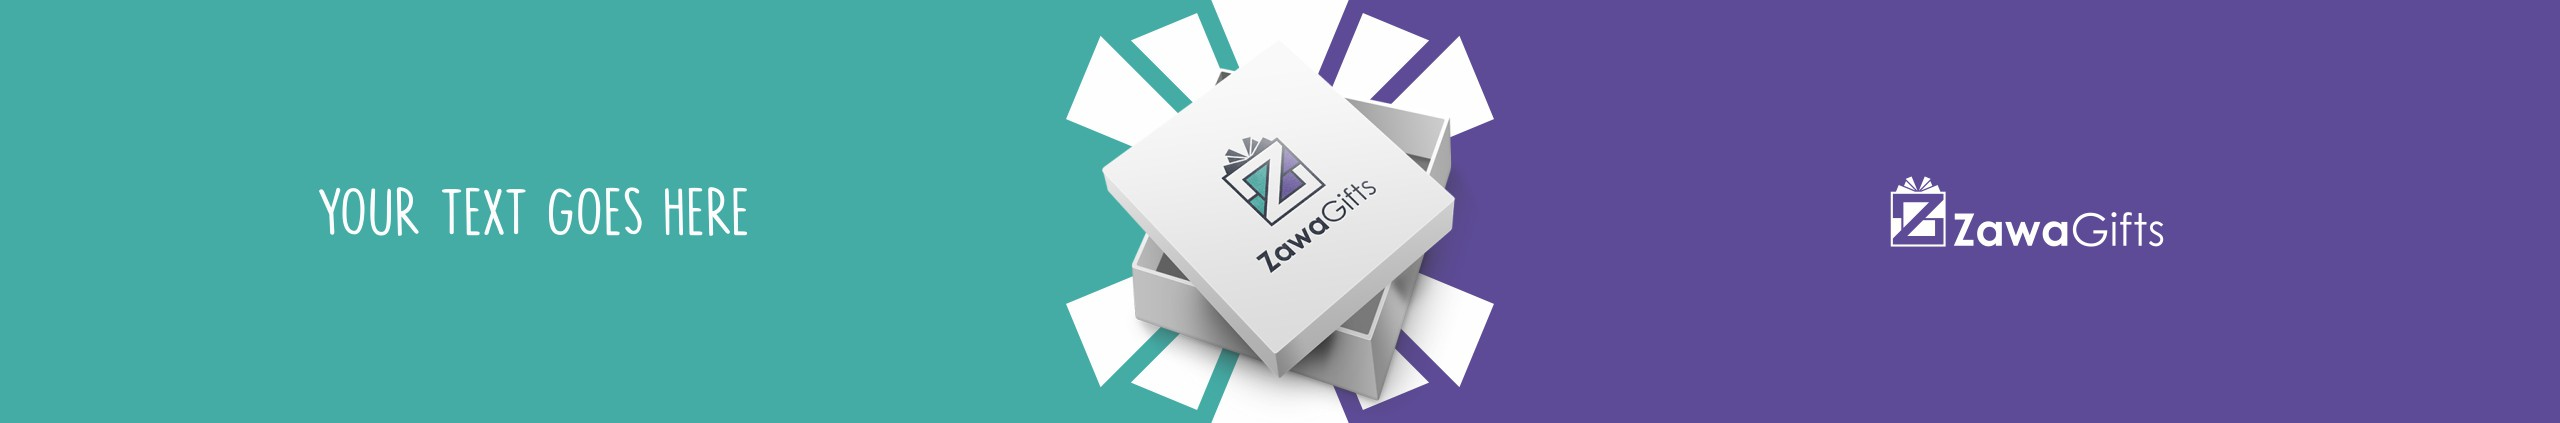 ZawaGifts